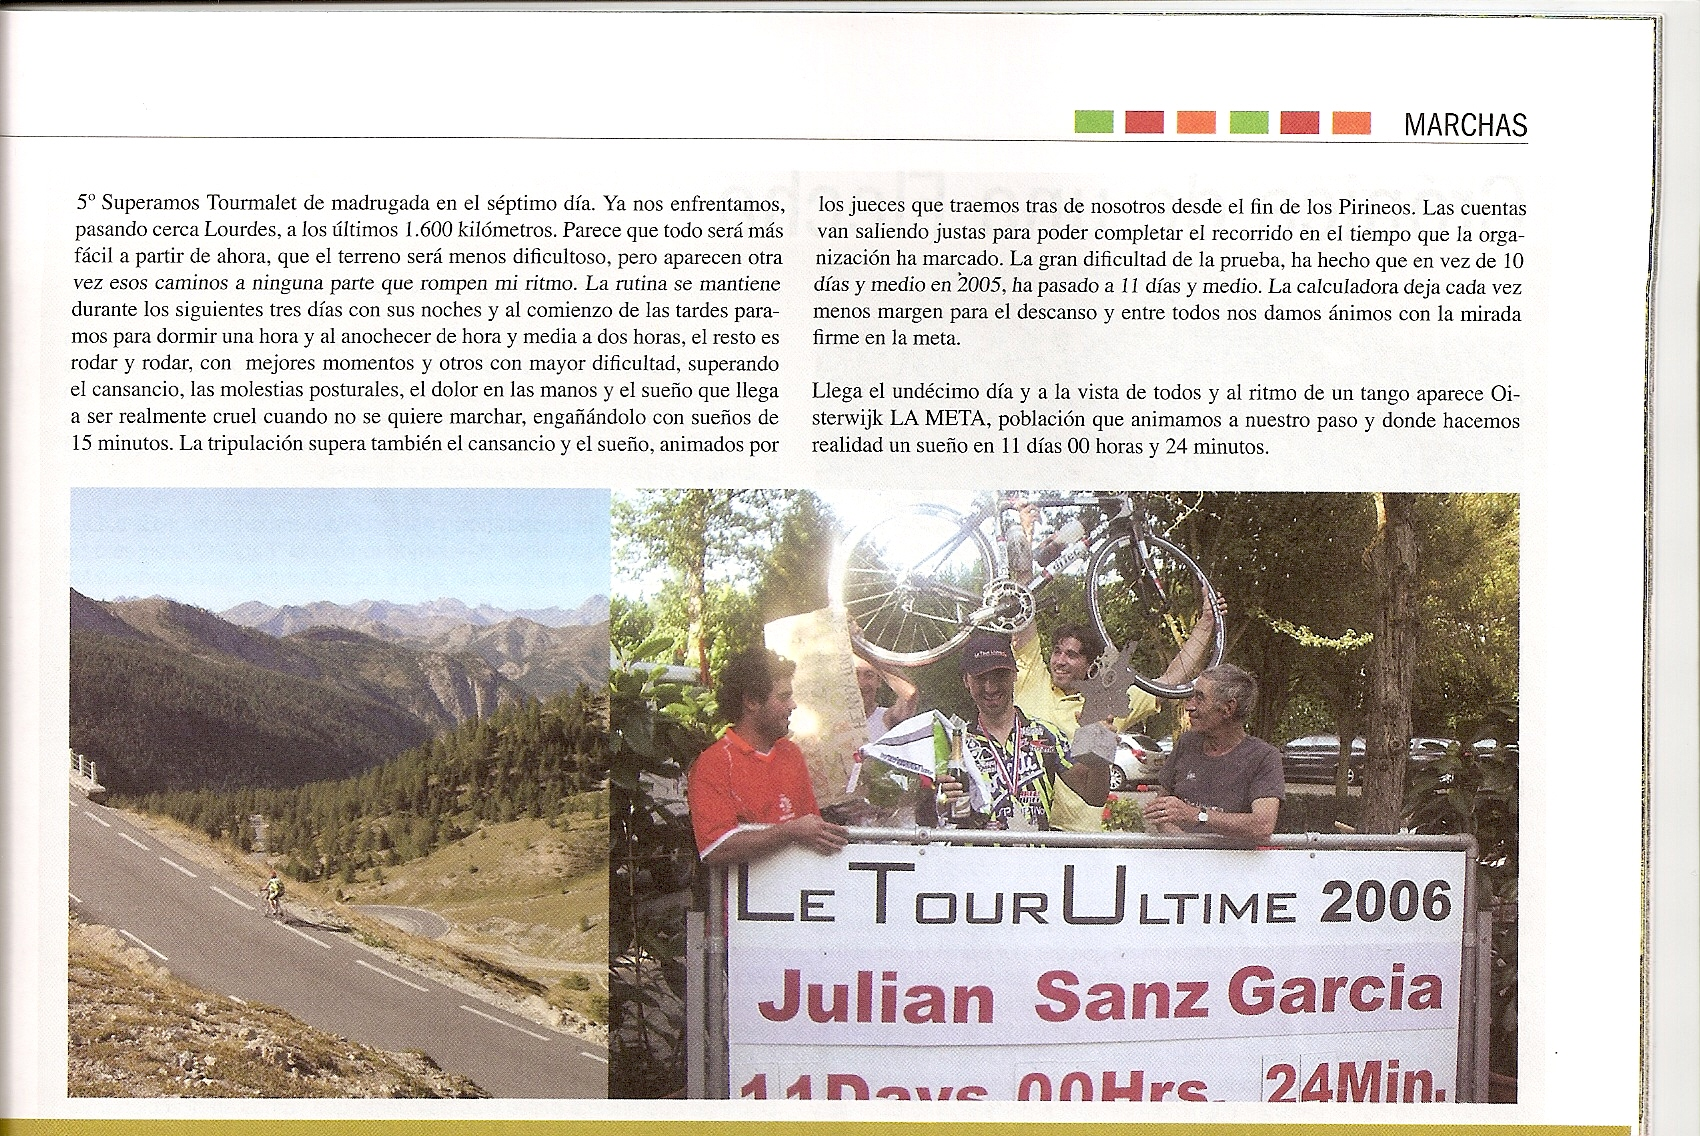 06 12 pedalier 2